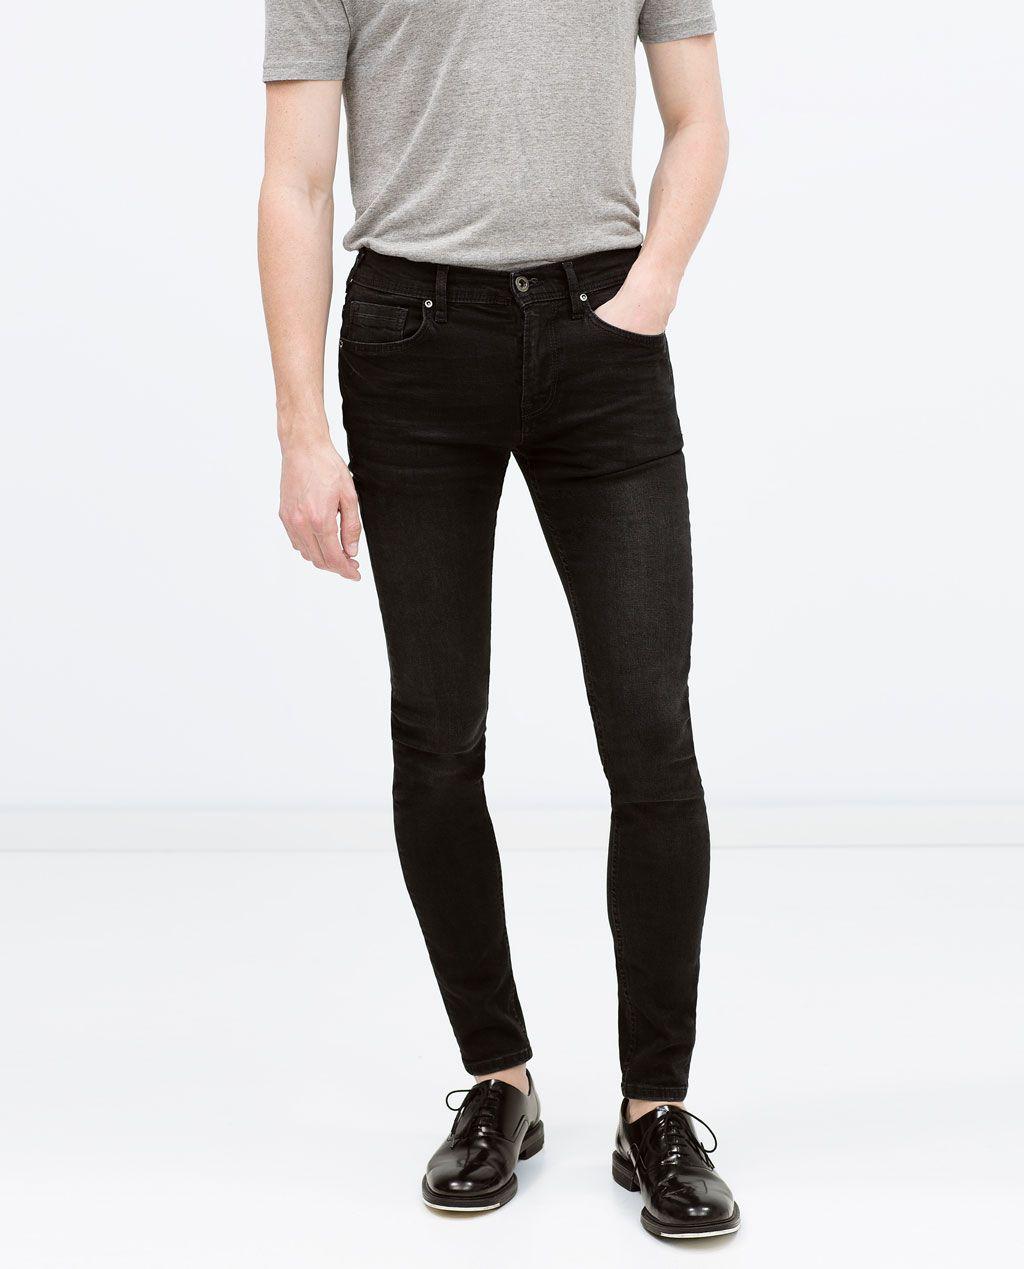 Pin de Jay en Ropa   Jeans hombre, Zara hombre, Ropa